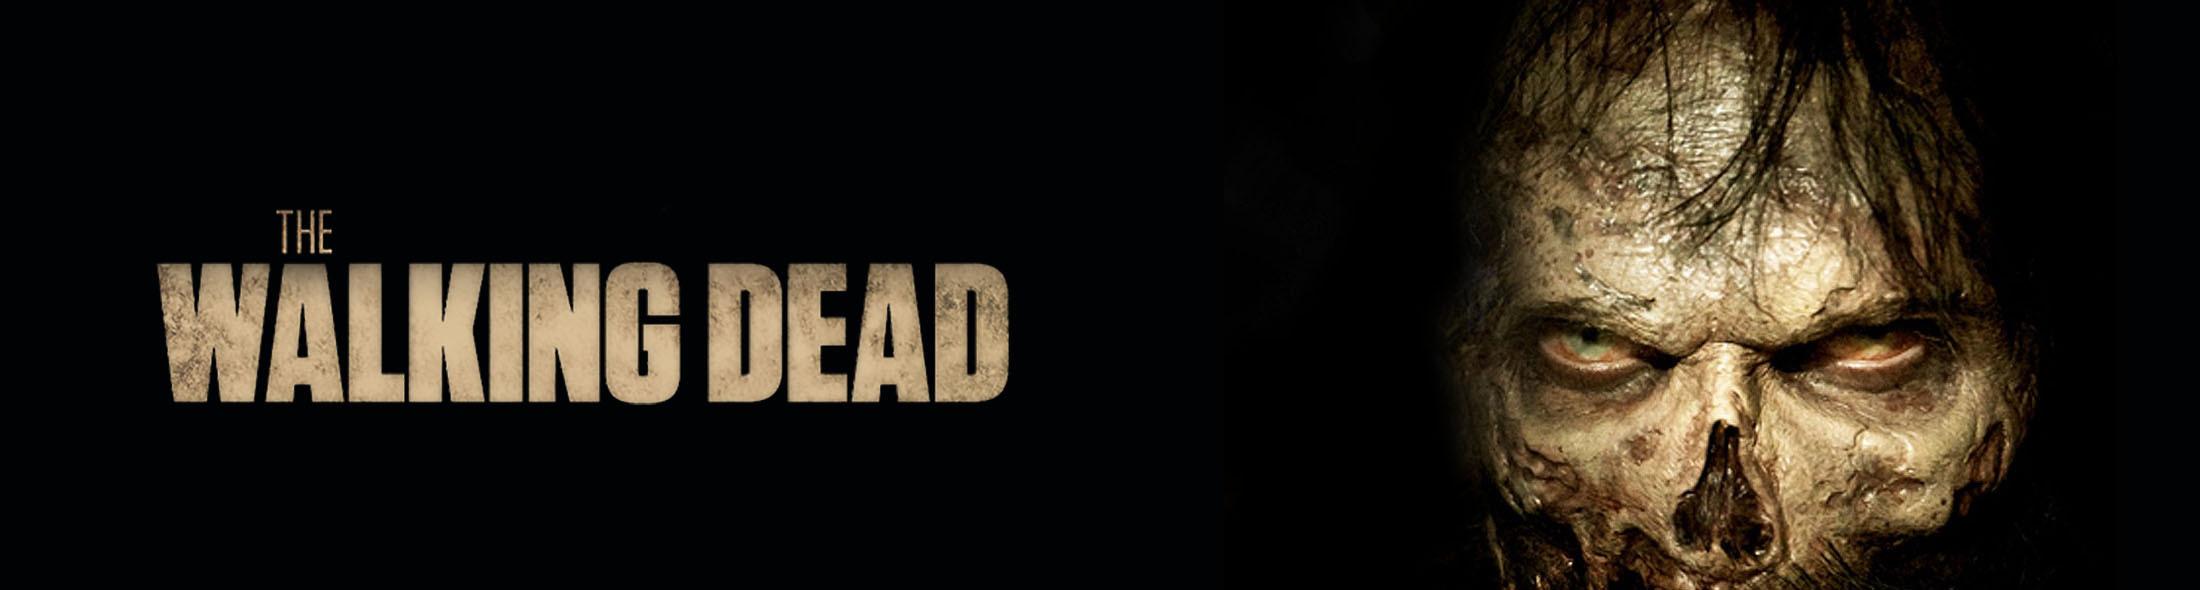 Koning en Eindbaas The Walking Dead